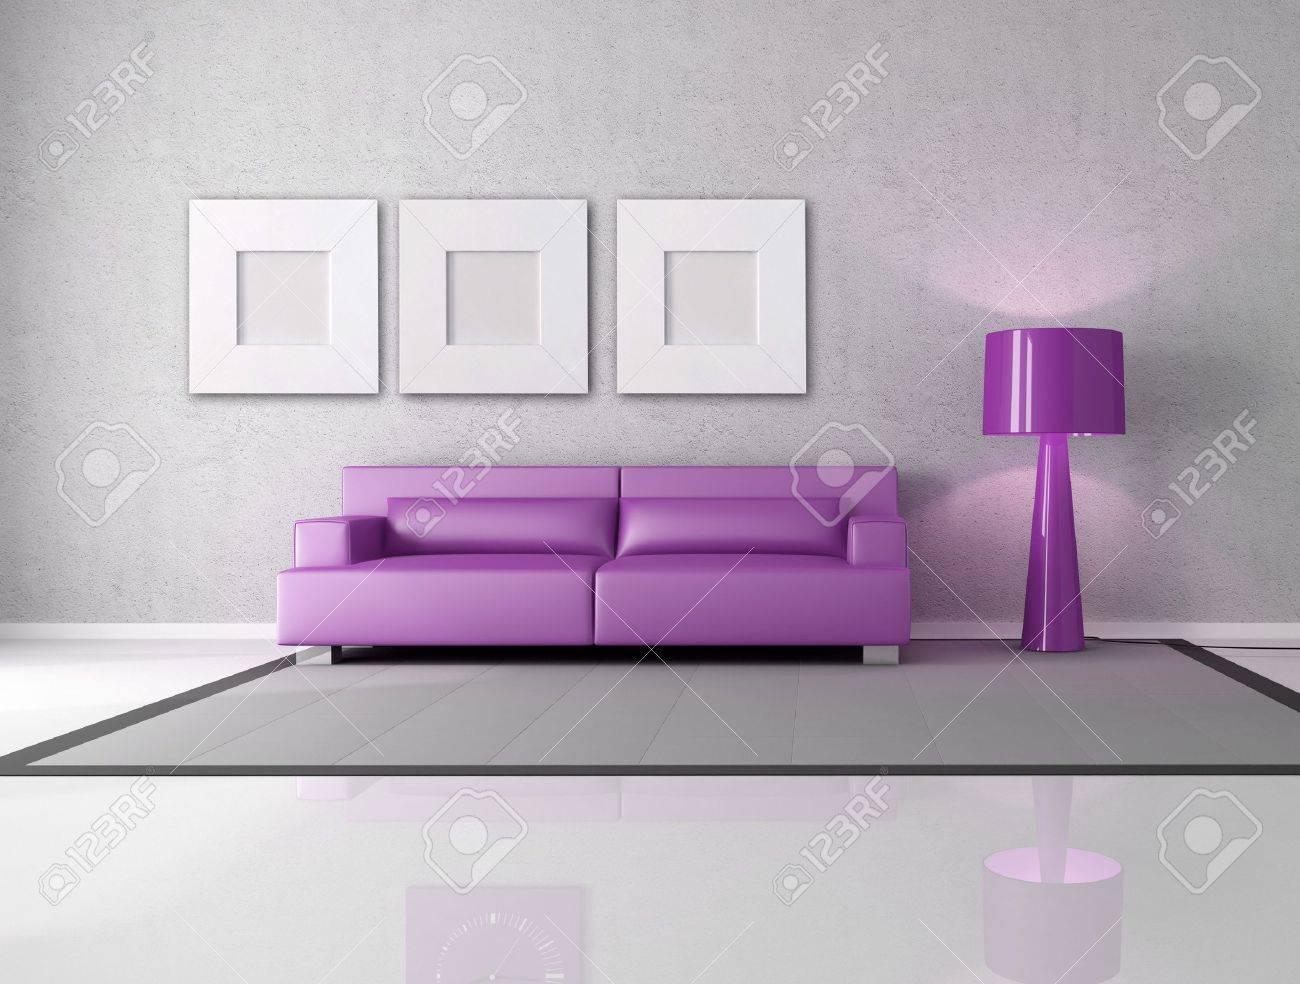 Purple Living Room Minimalist Gray And Purple Living Room With Fashion Lamp Stock